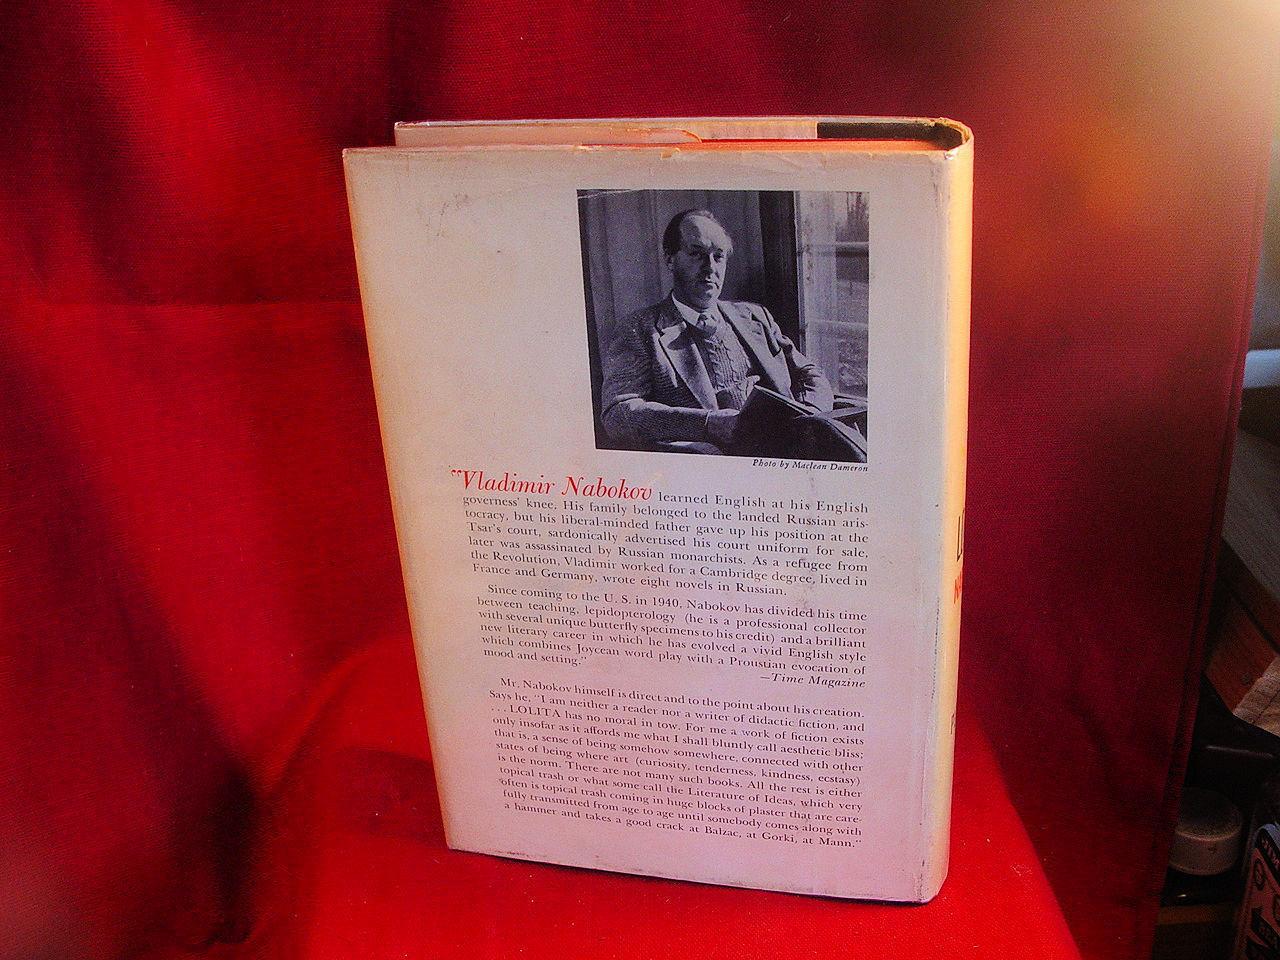 LOLITA Vladimir Nabokov - First U.S. edition